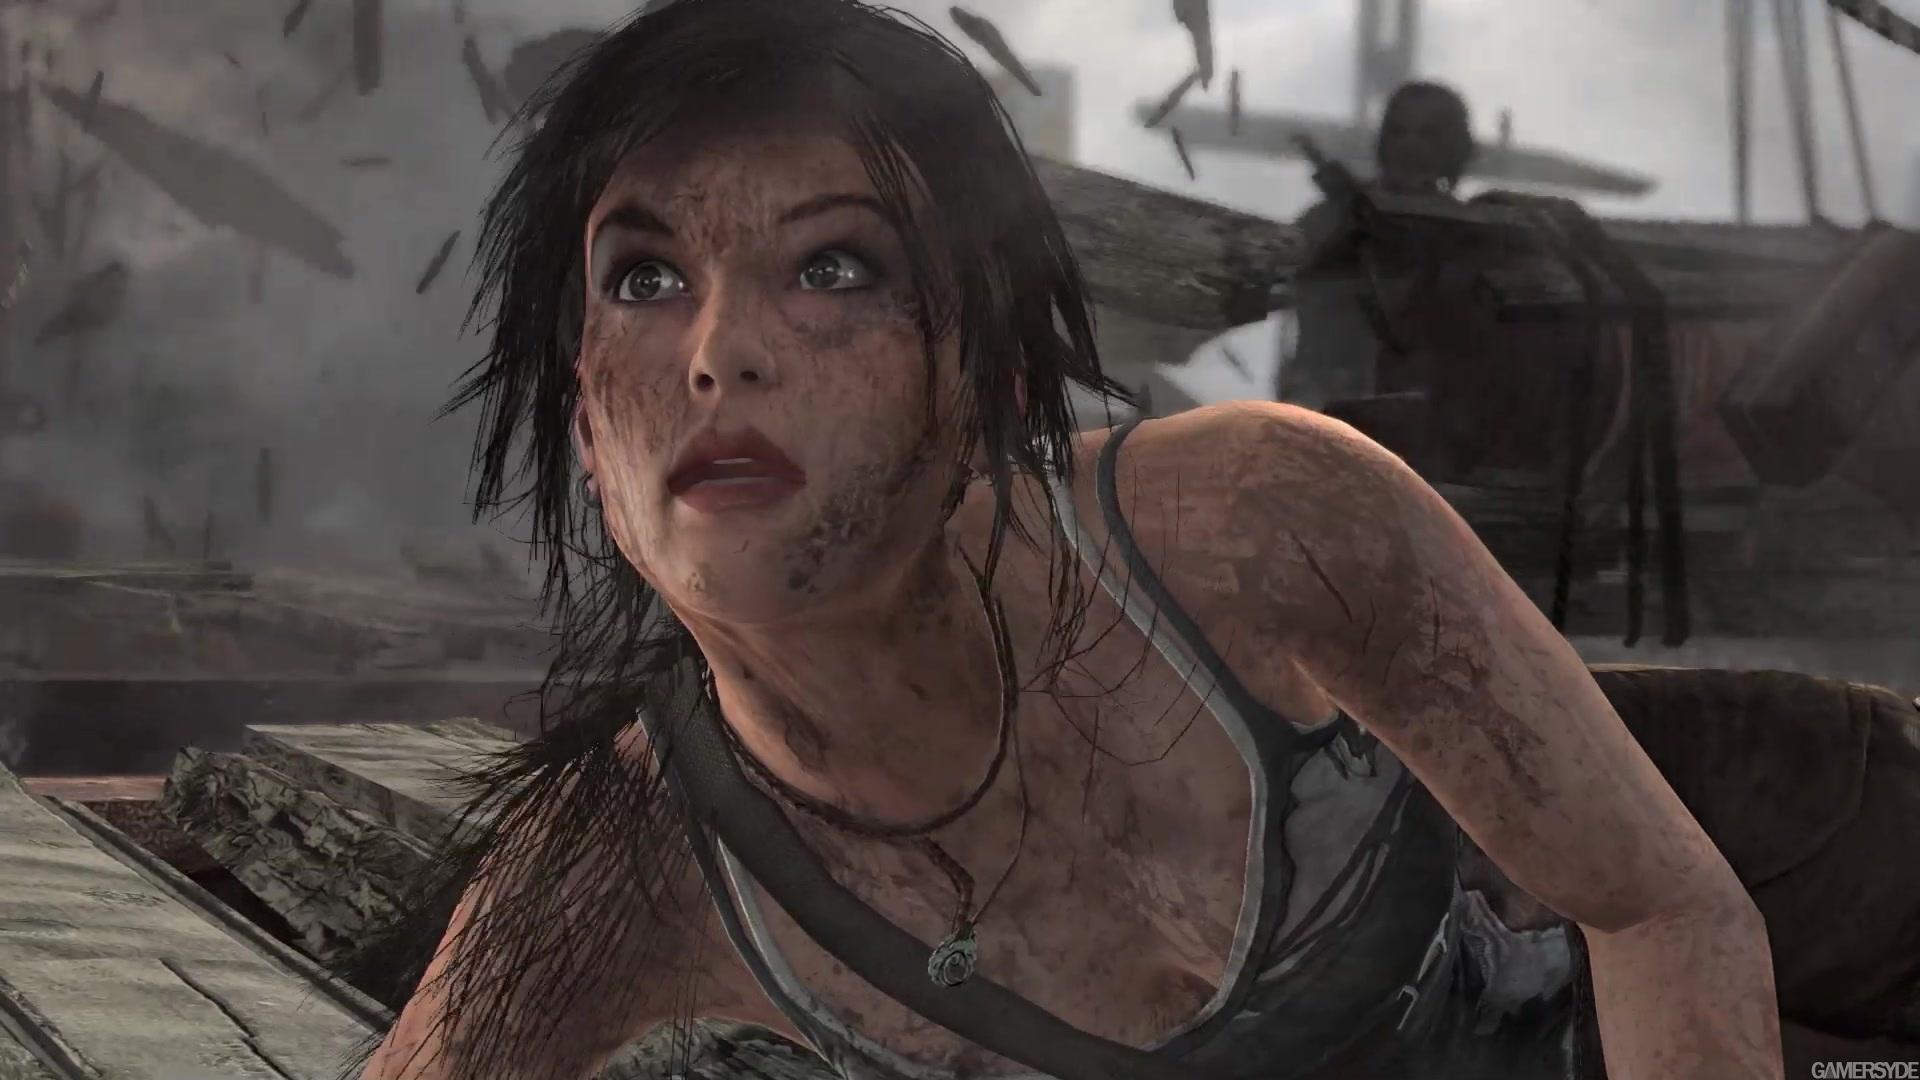 image tomb raider 24052 1912 0020 تصاویر جدیدی از عنوان Tomb Raider: Definitive Edition منتشر شد